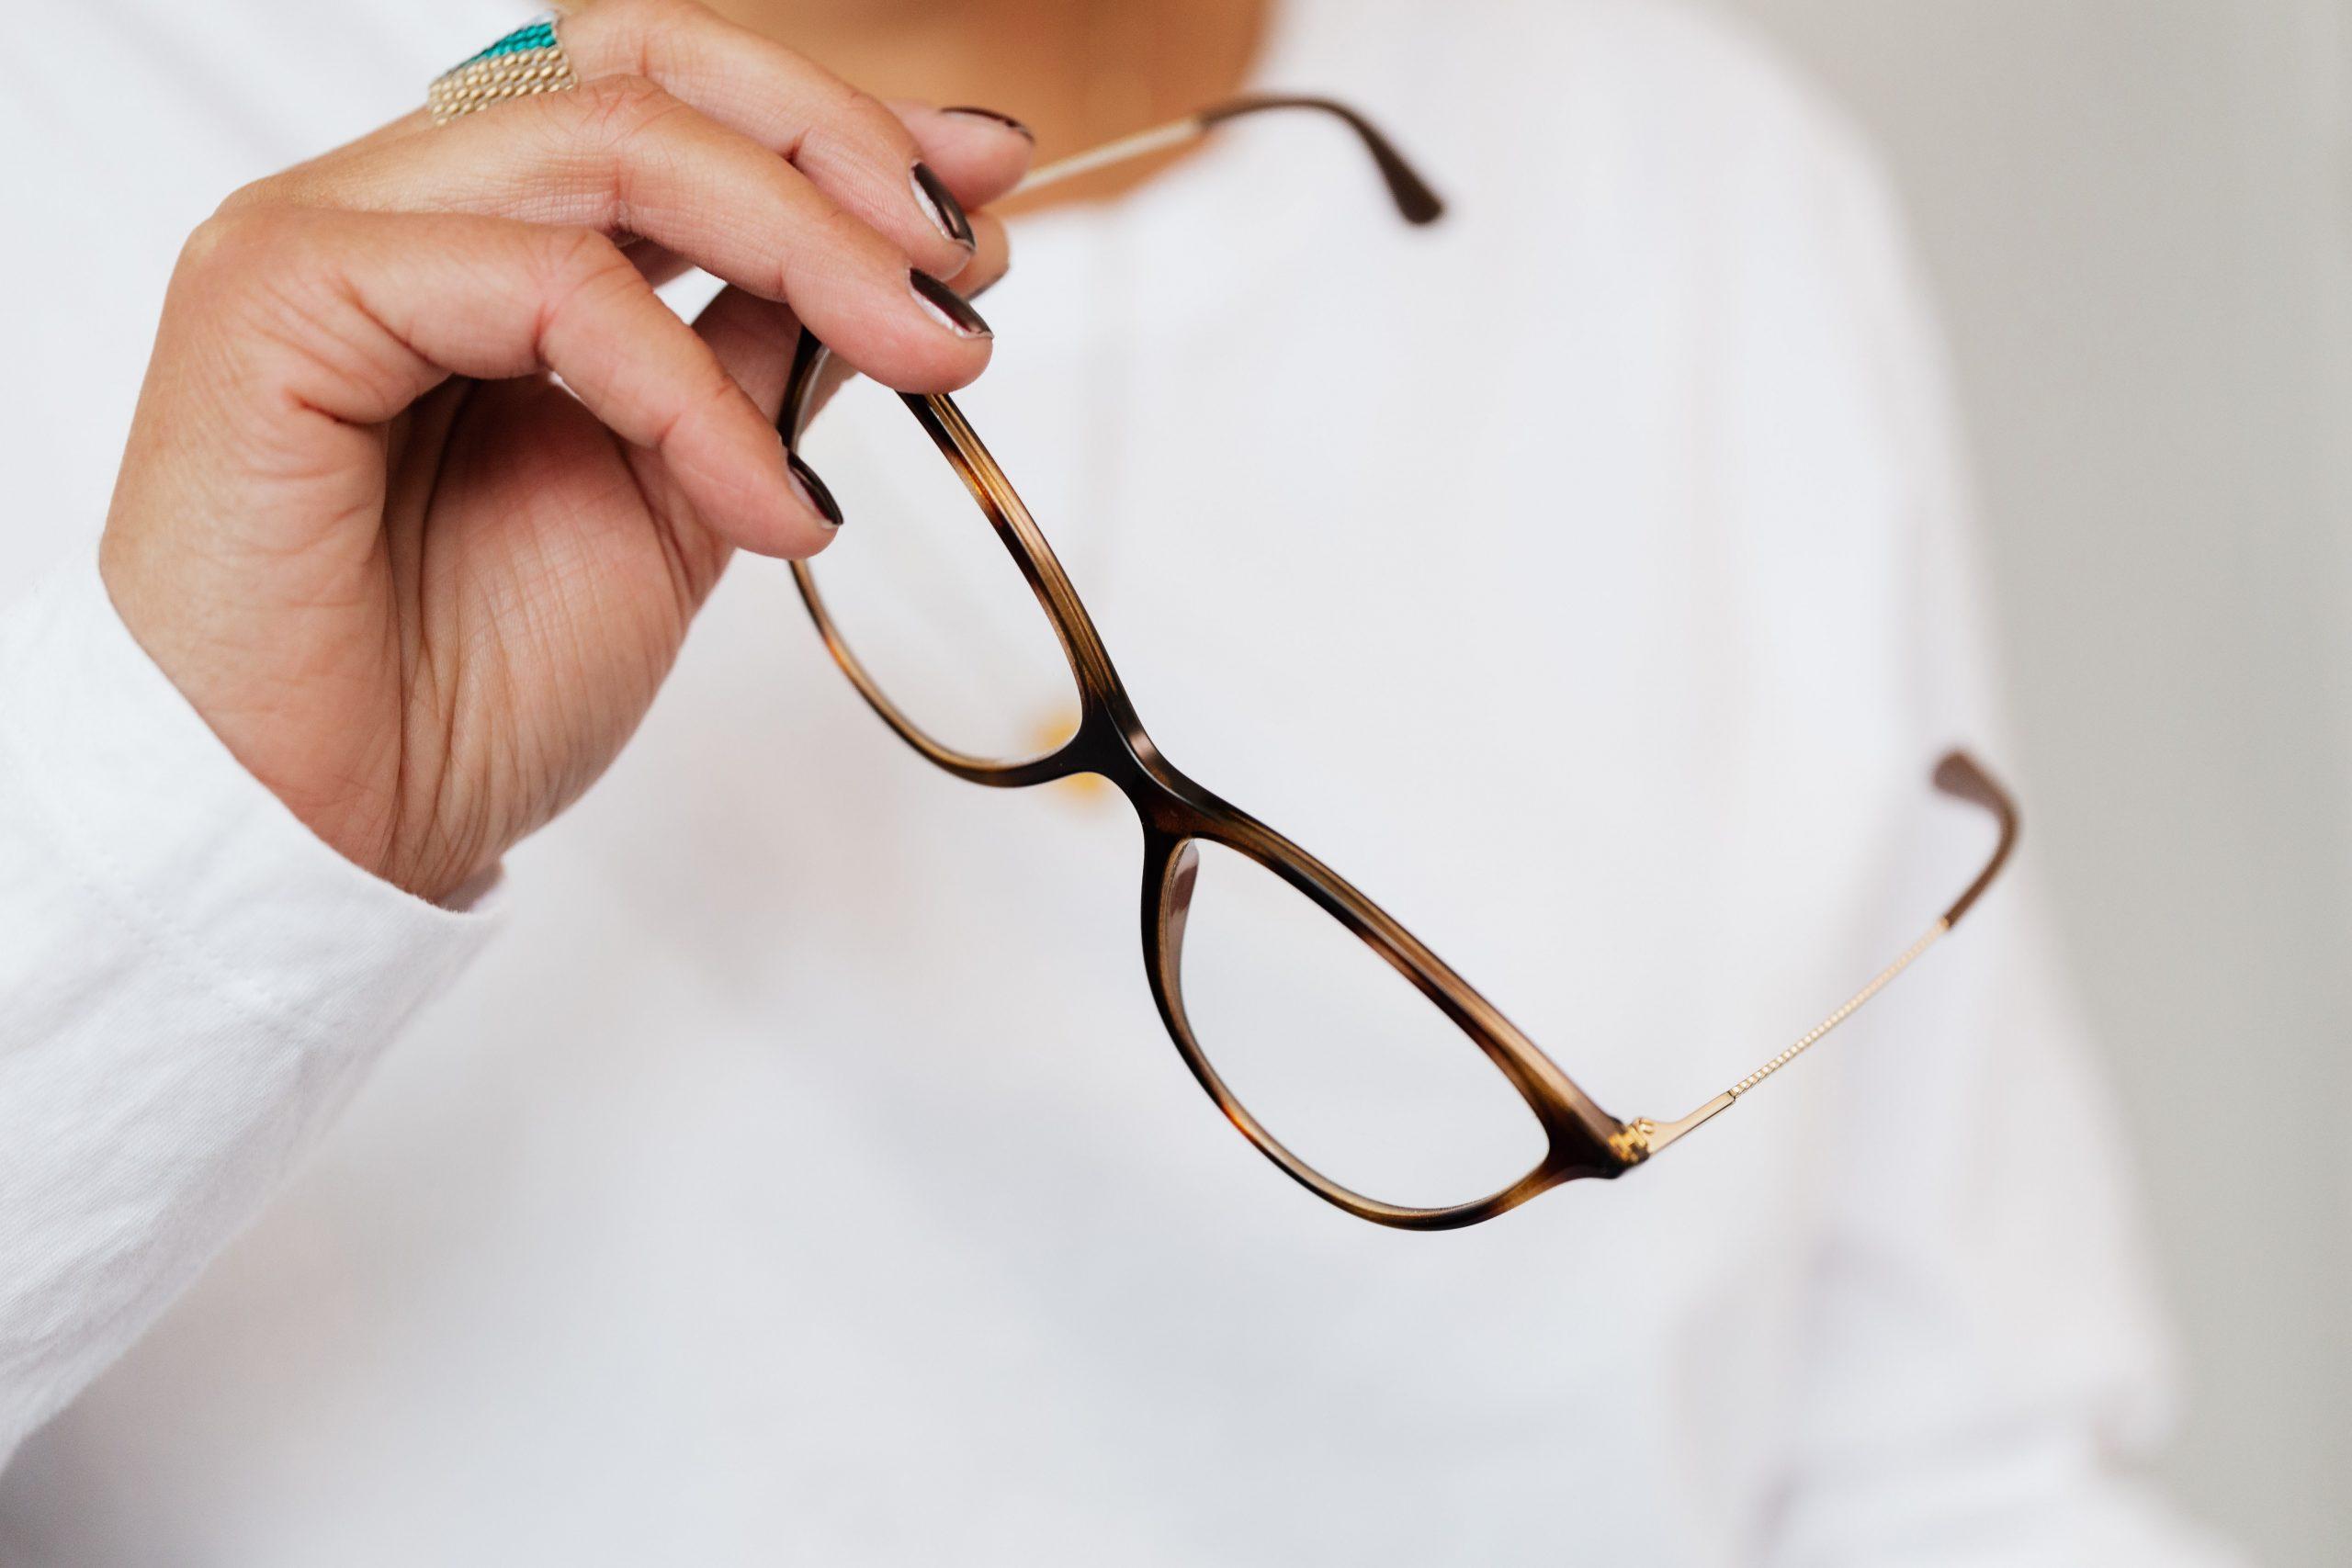 pérdida de visión repentina